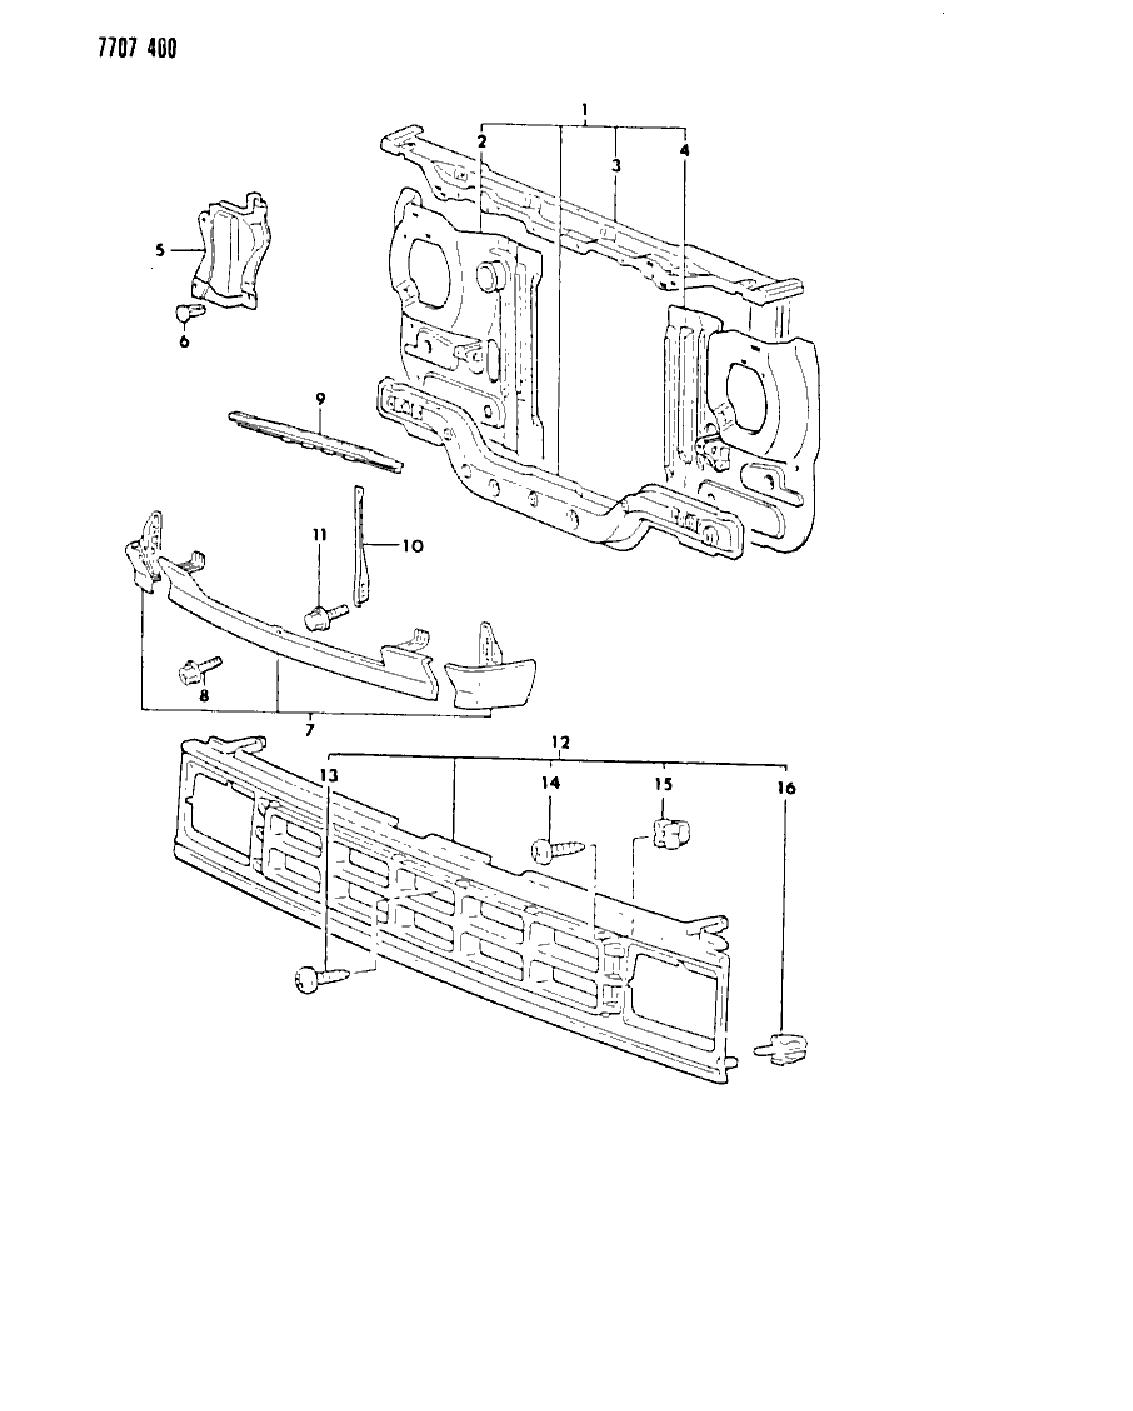 1987 Dodge Ramcharger Wiring Diagram